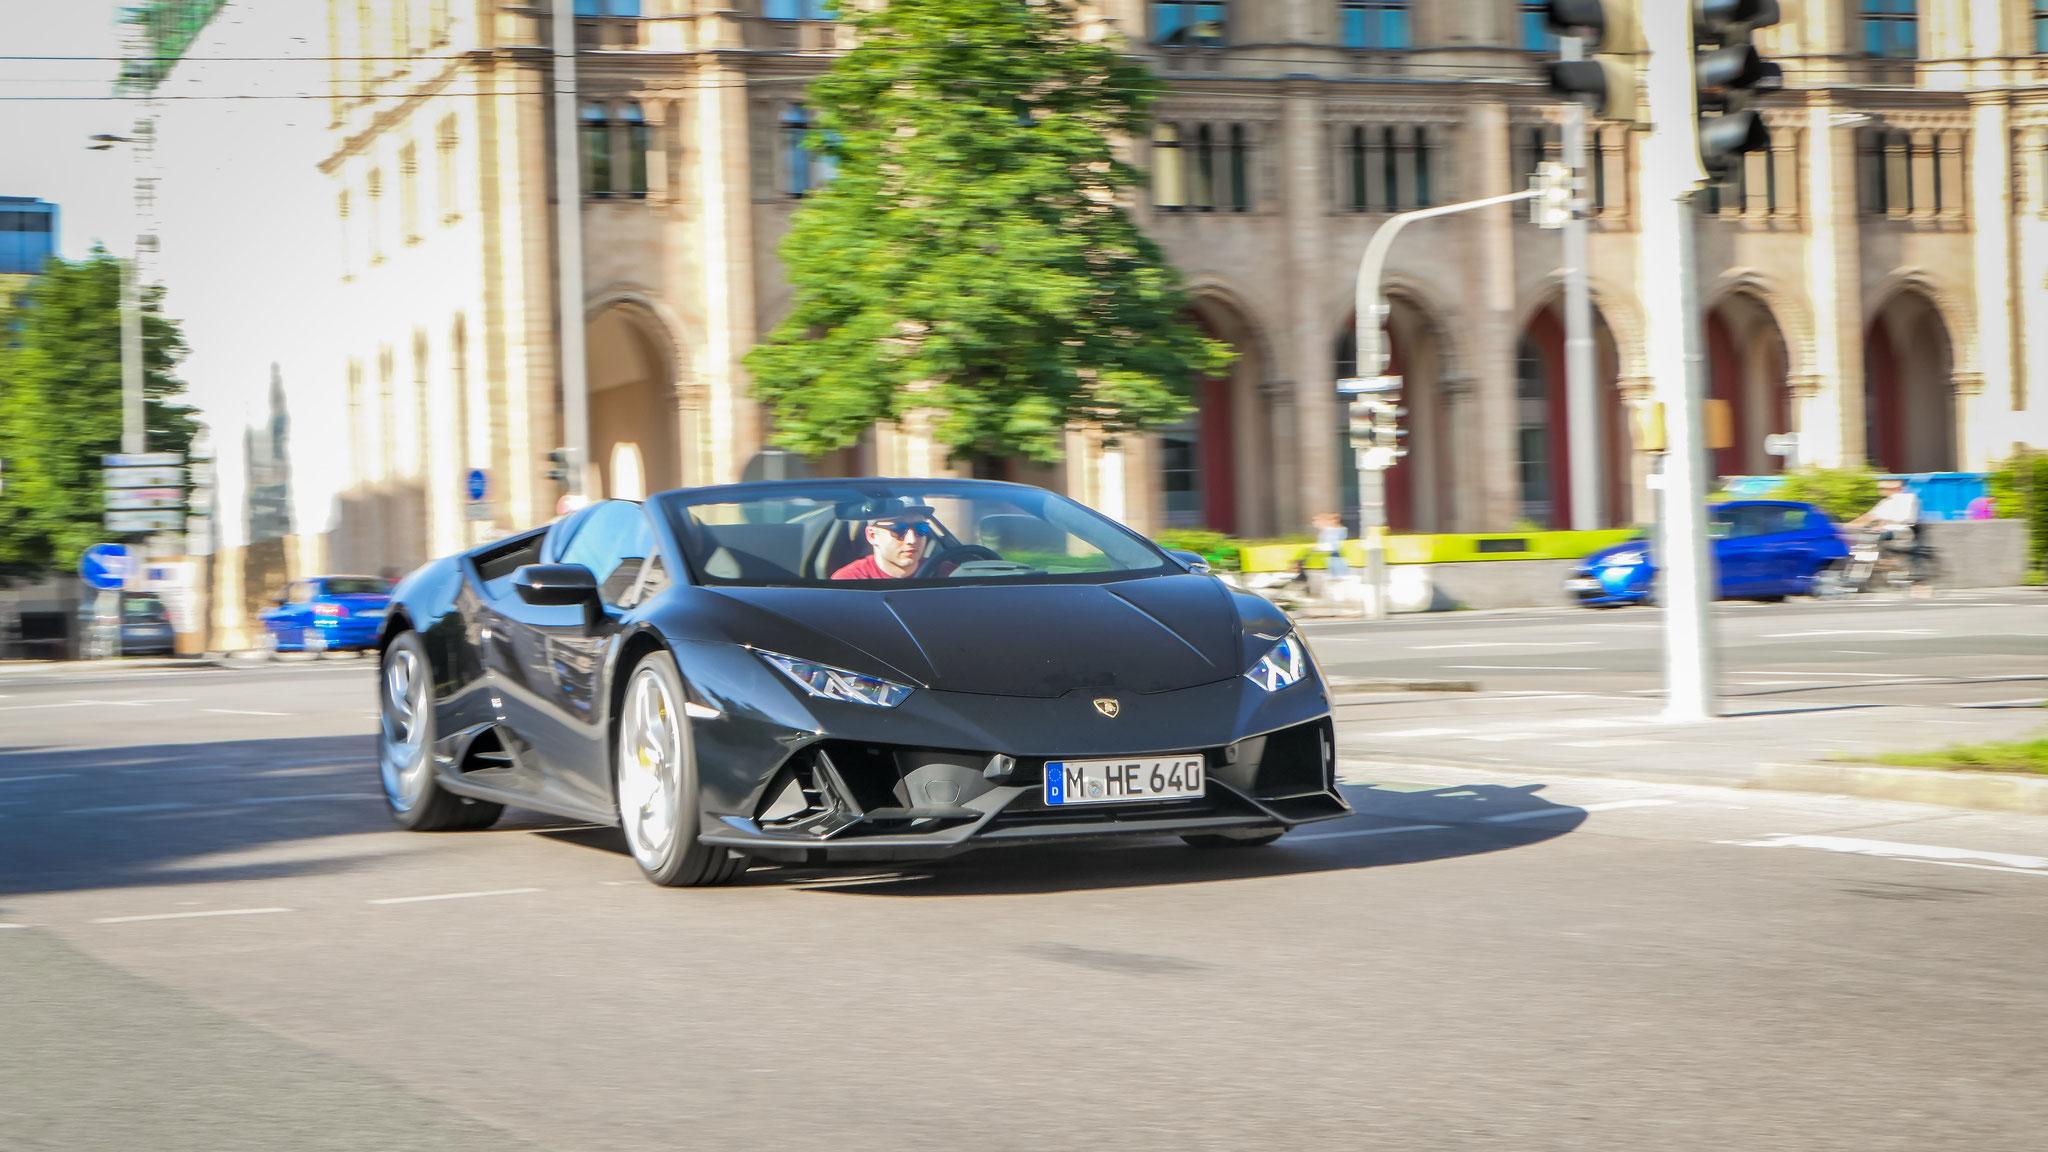 Lamborghini Huracan Evo Spyder - M-HE-640